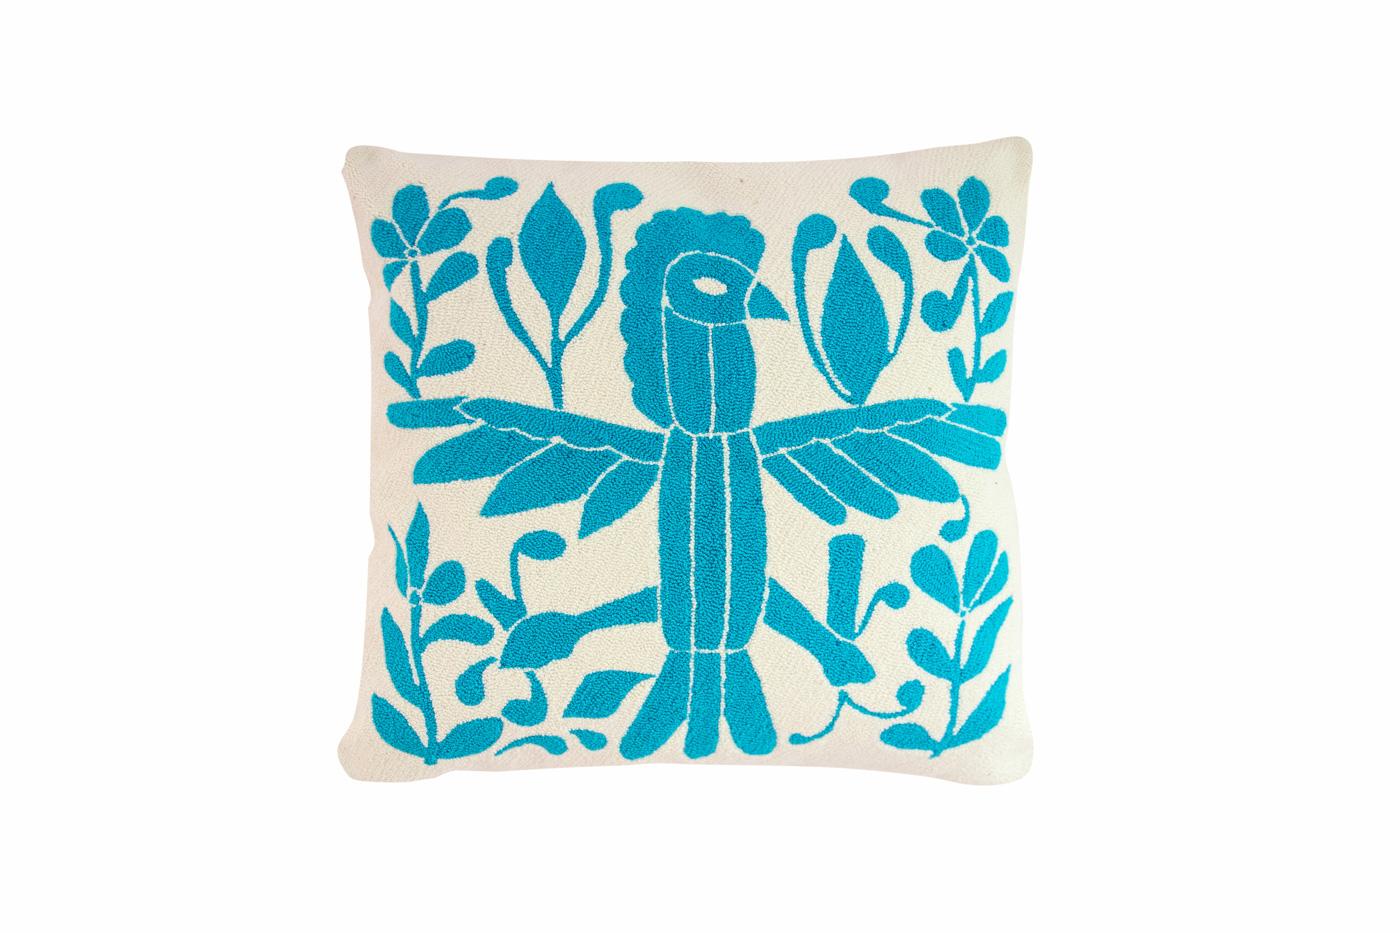 Puyao Mexican bird cushion